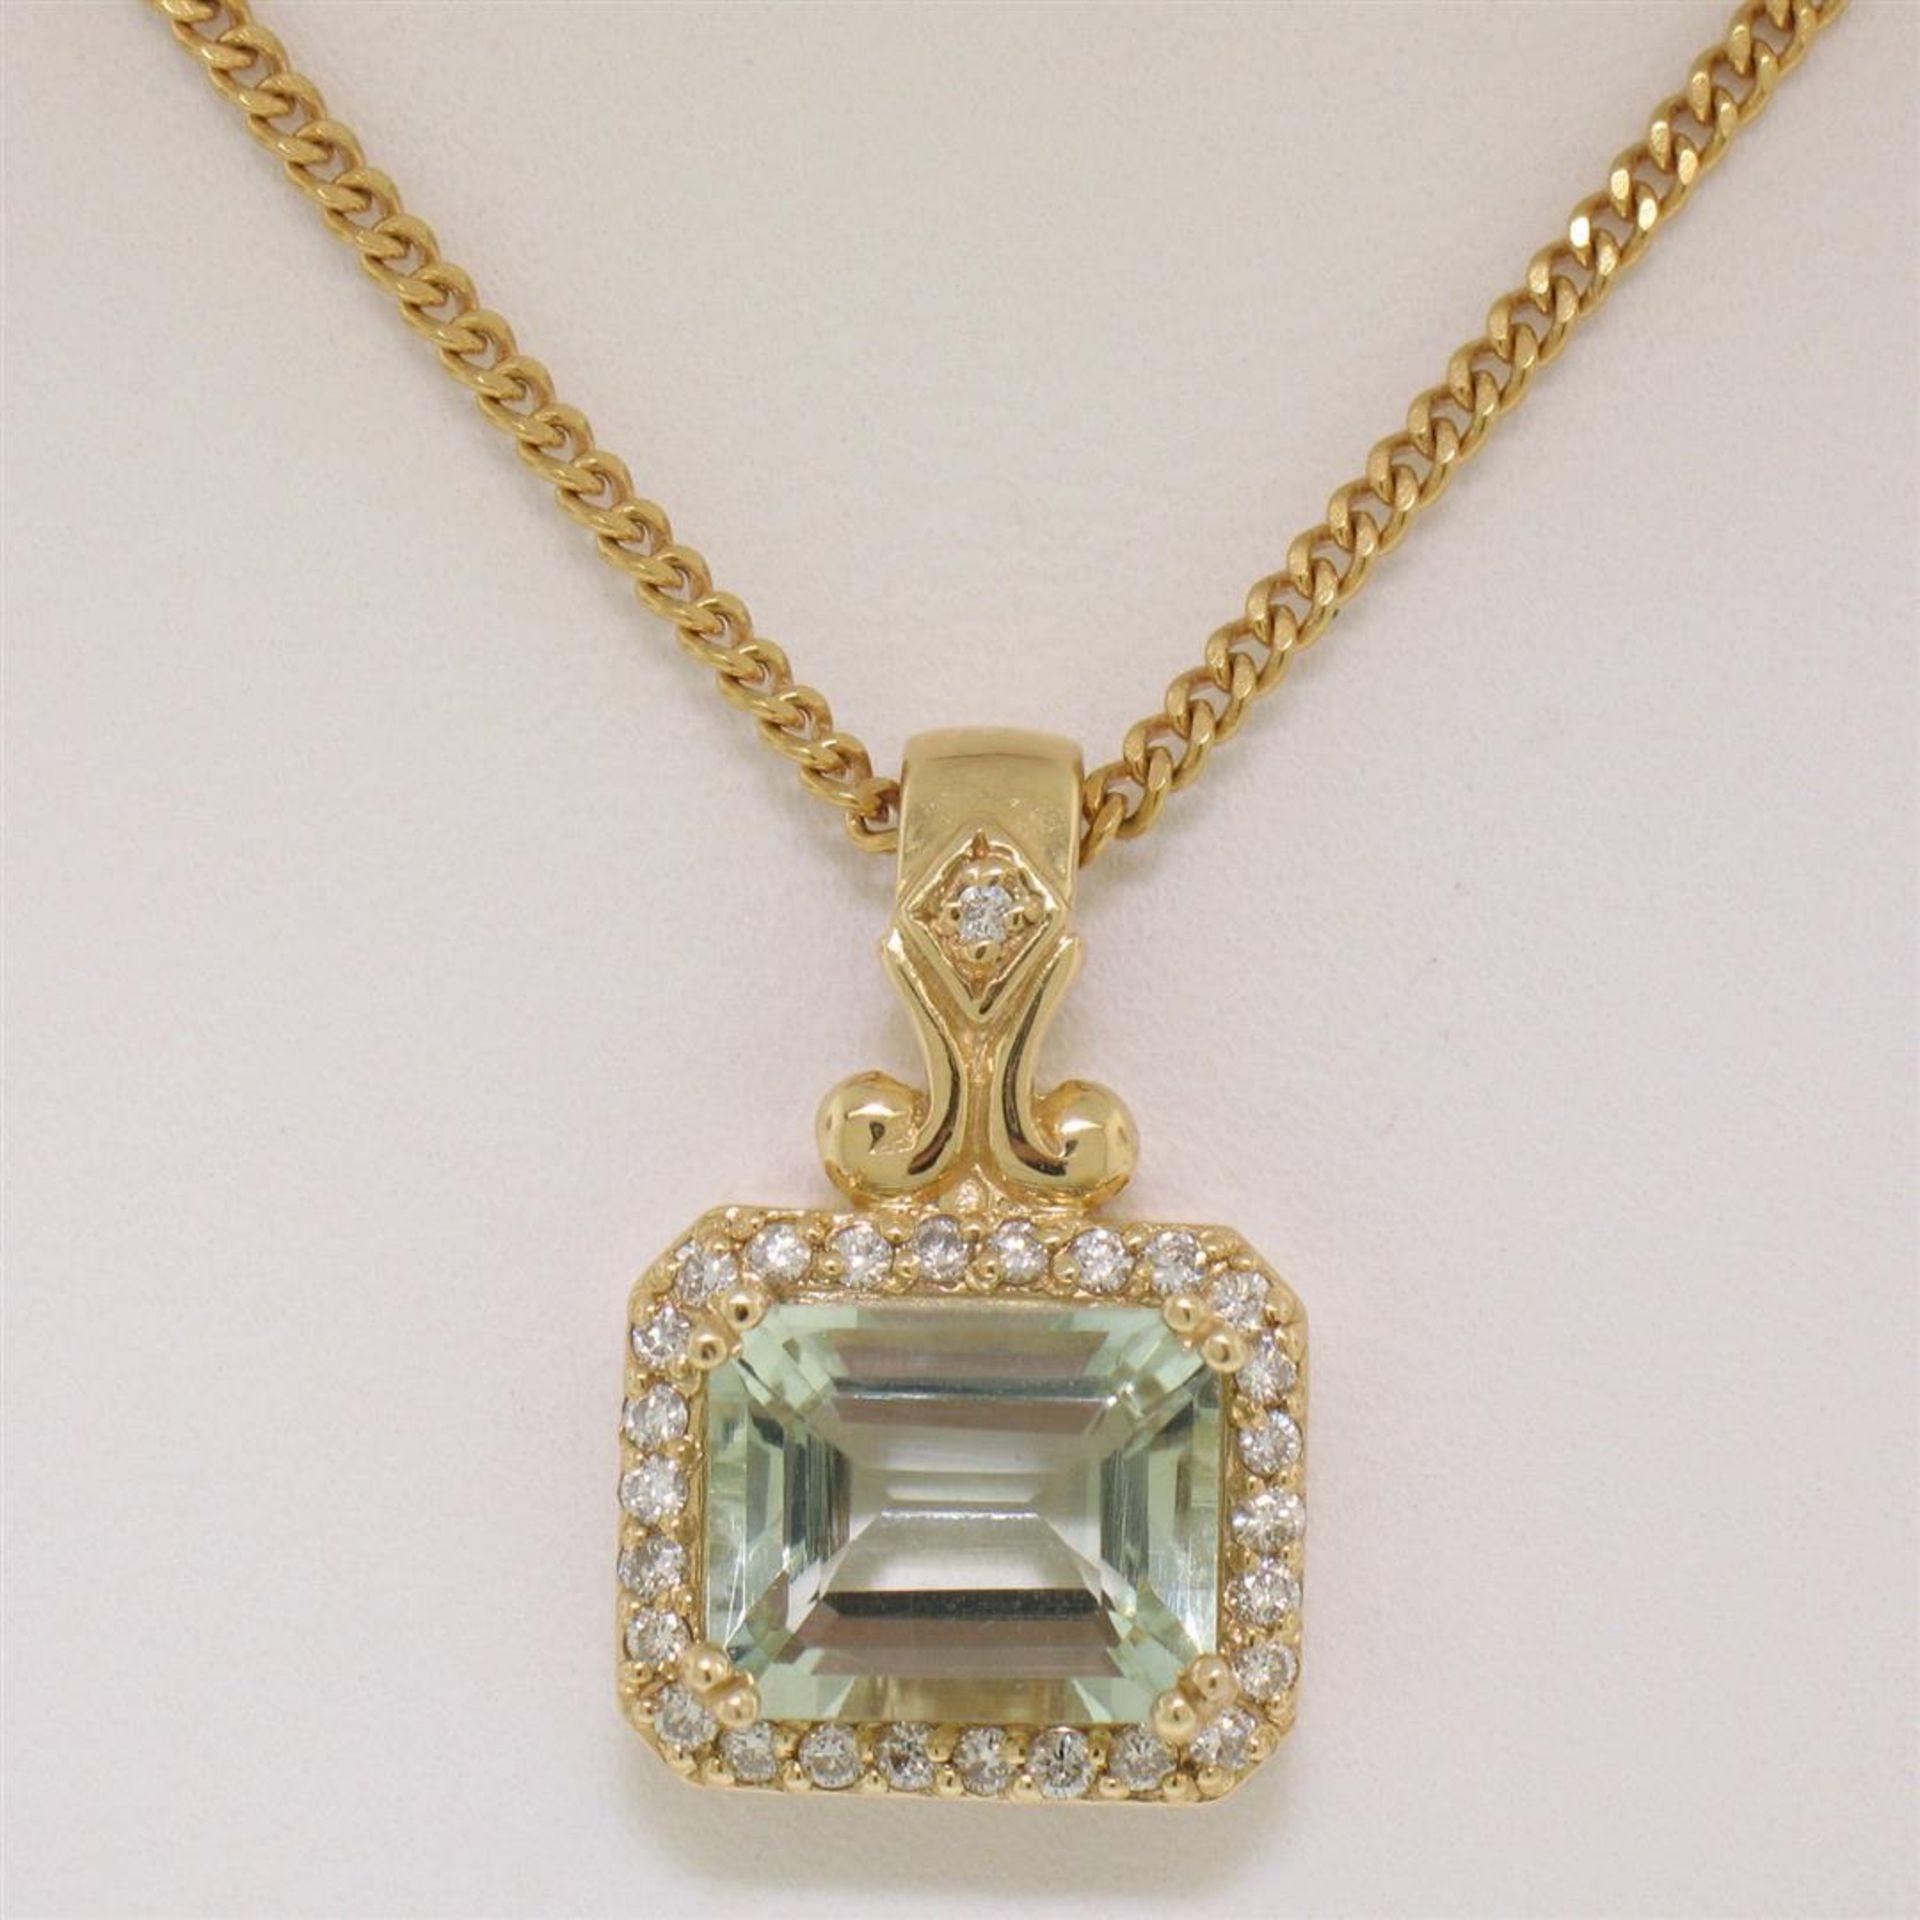 "14K Yellow Gold 3.77ctw VS Diamond Green Amethyst Pendant w/ 20"" Curb Chain - Image 3 of 7"